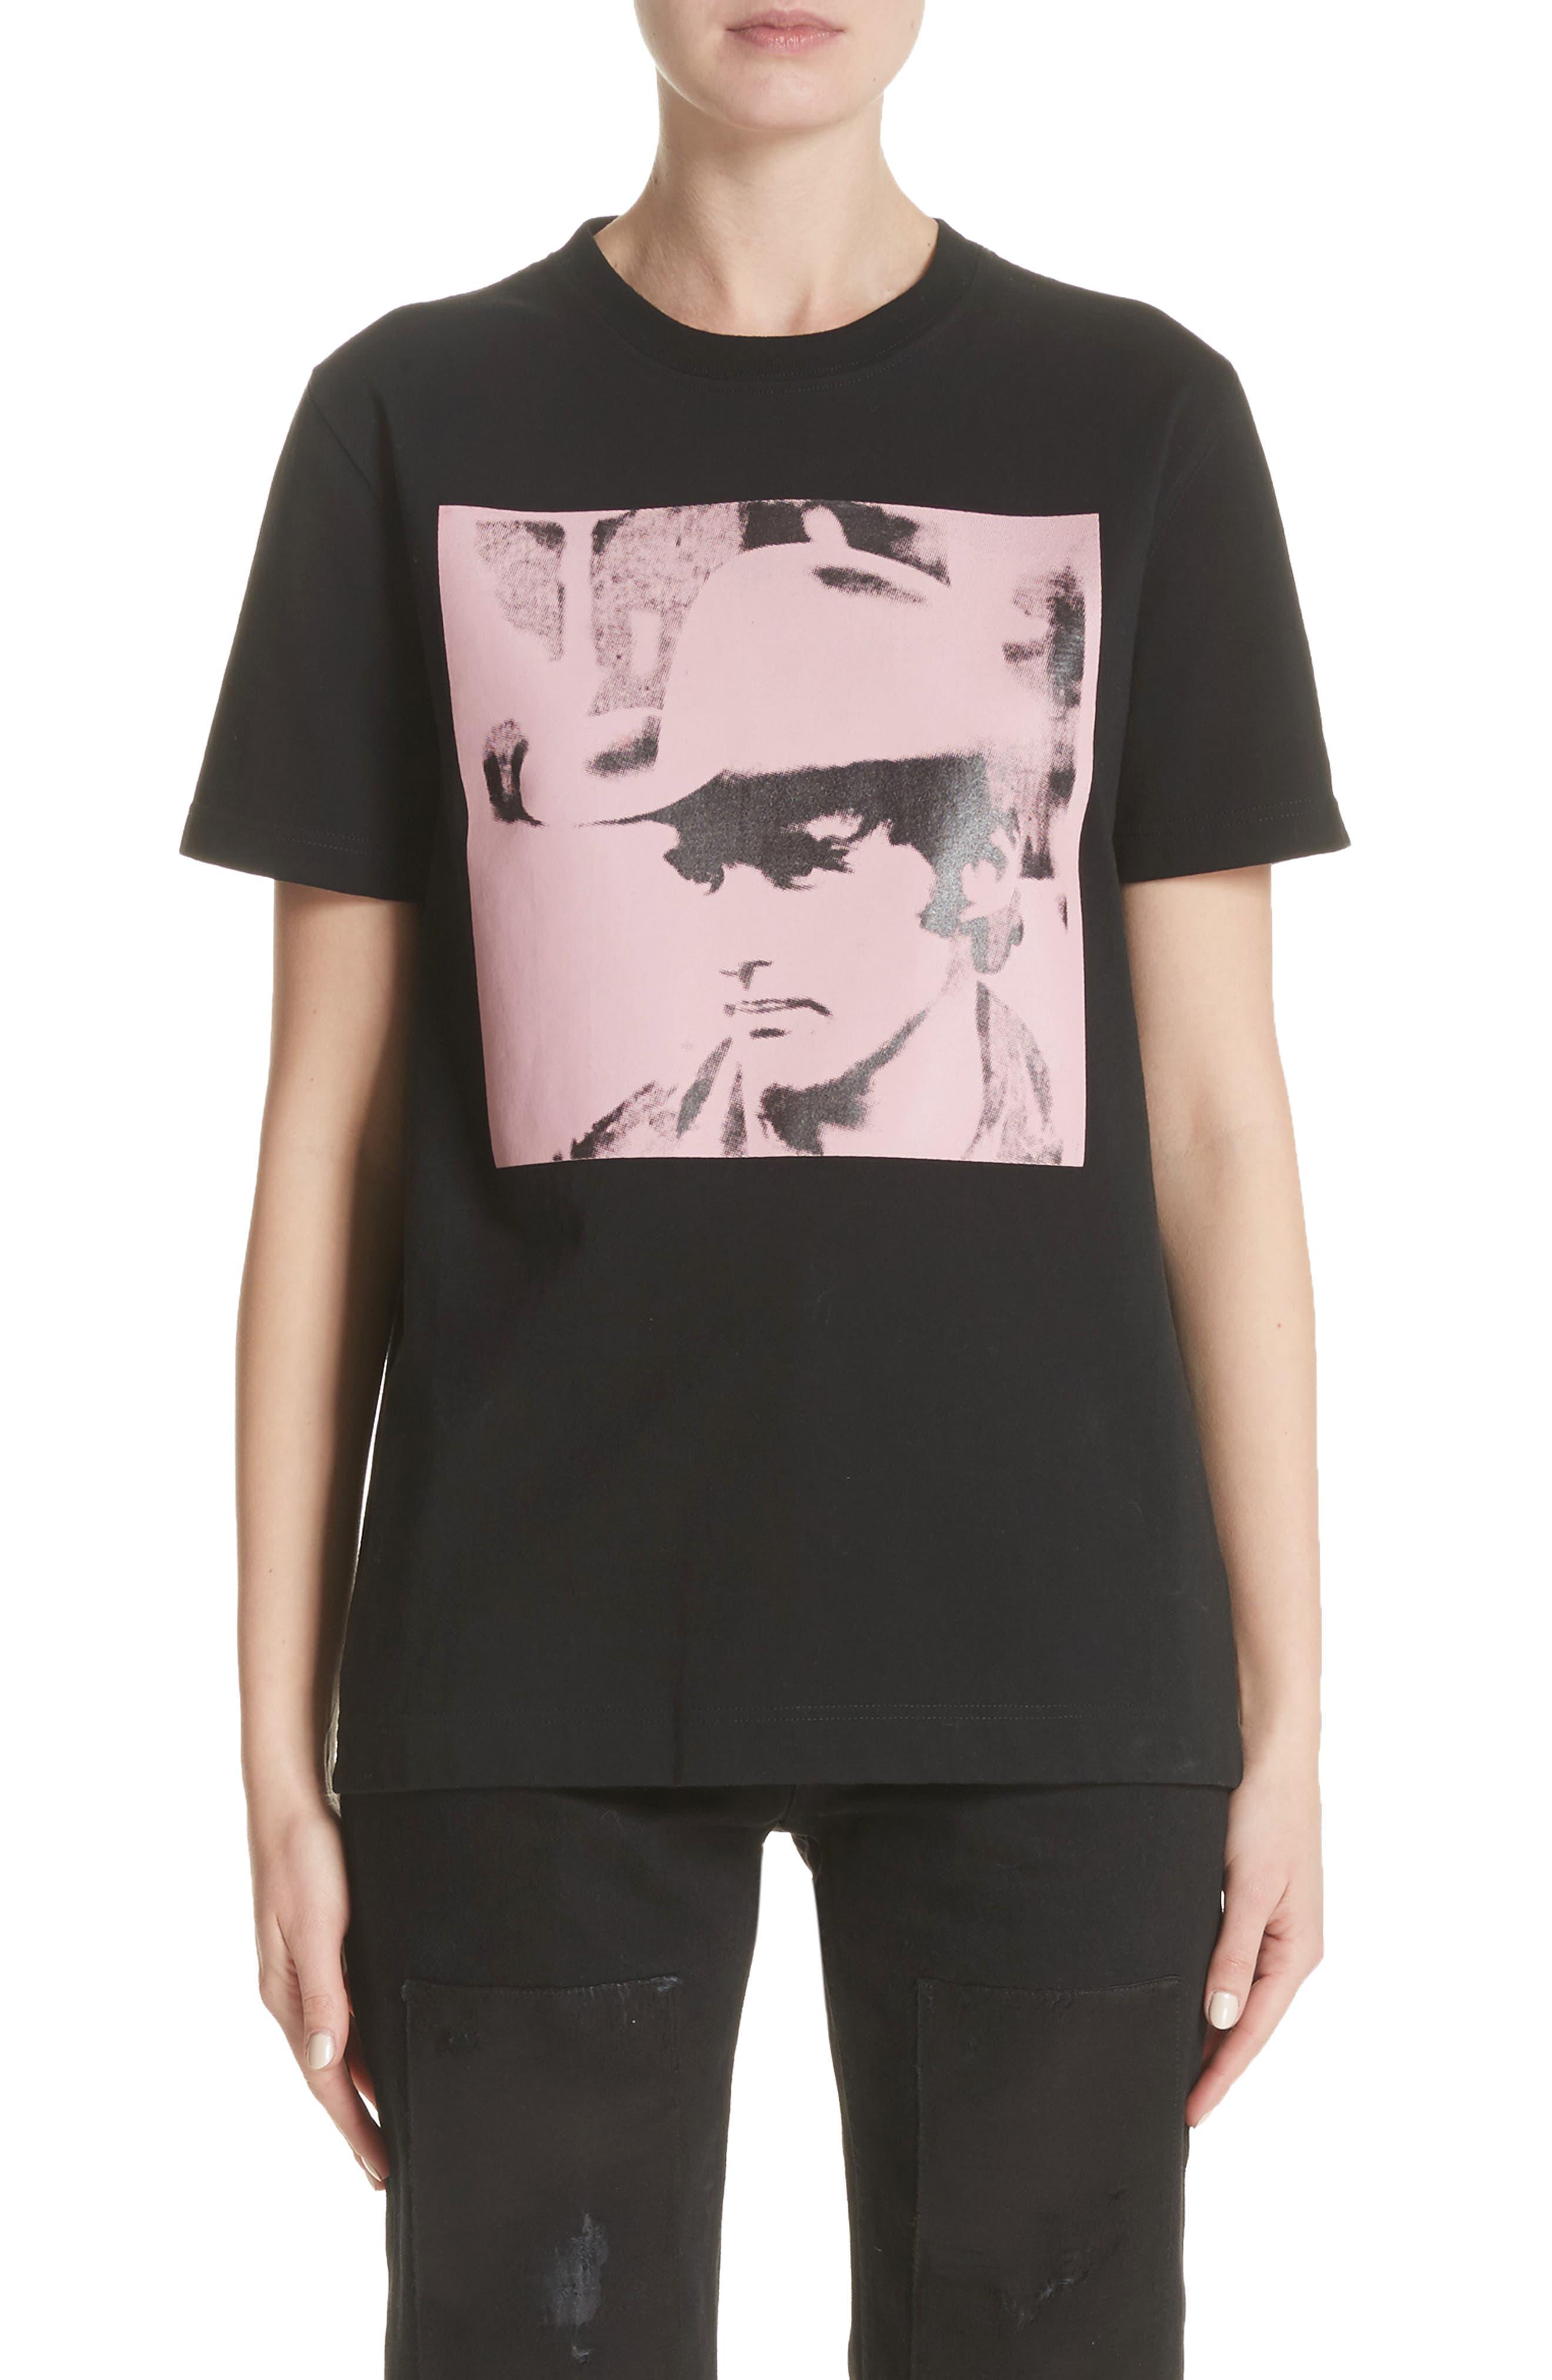 CALVIN KLEIN 205W39NYC x Andy Warhol Foundation Dennis Hopper Tee